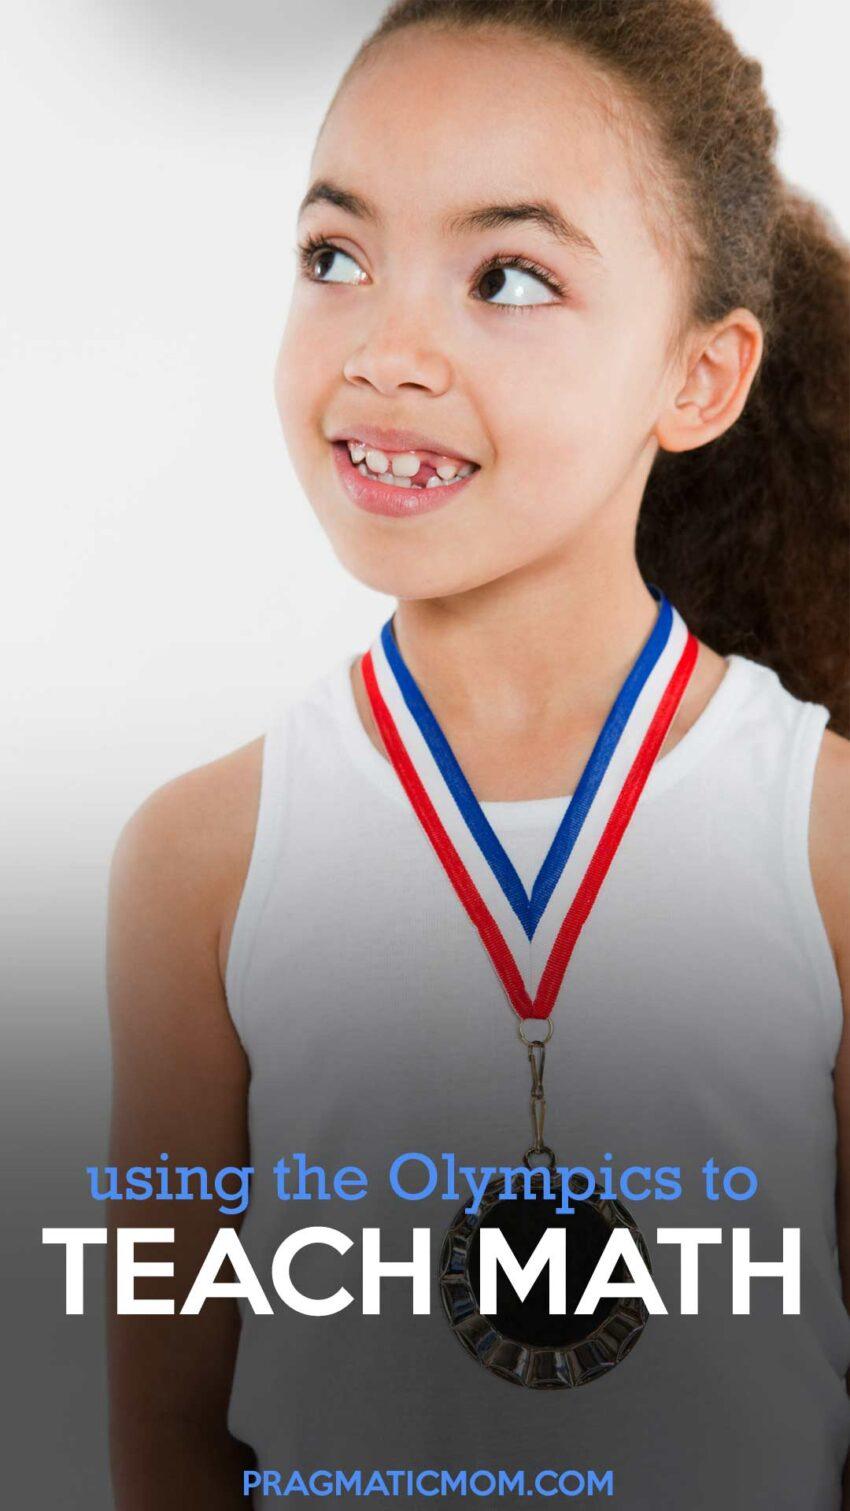 Using Olympics to Teach Math